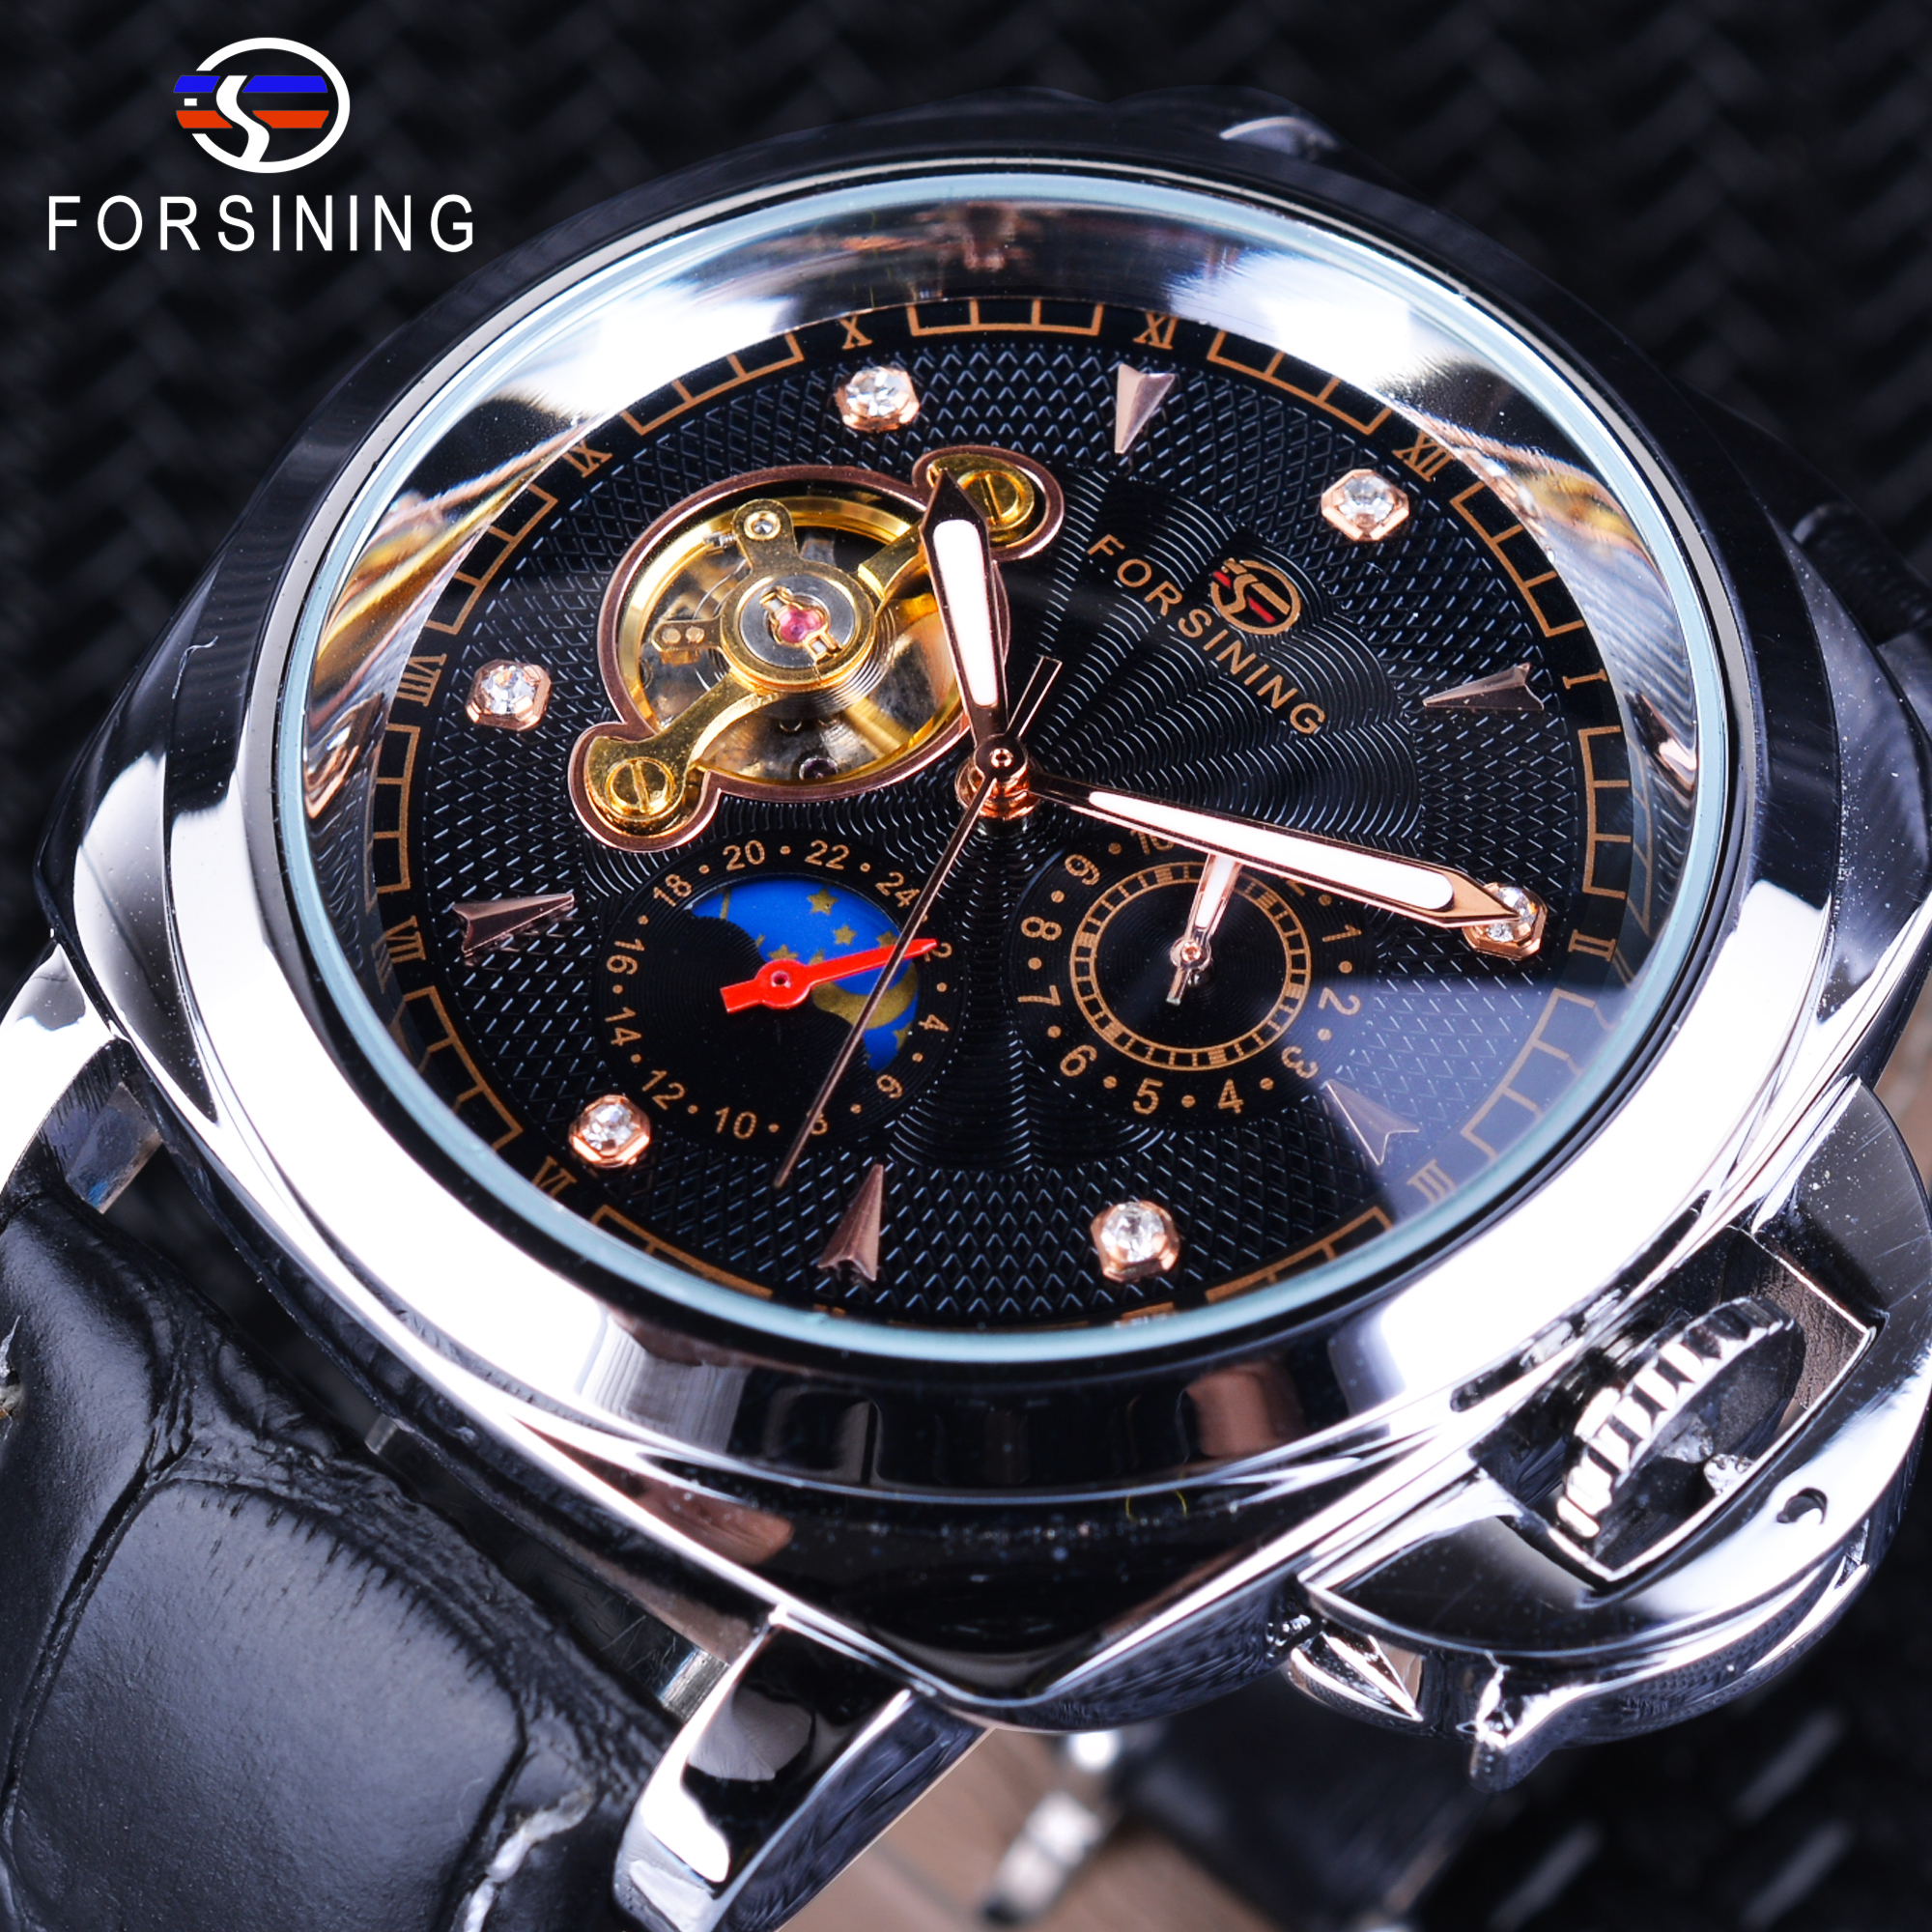 Forsining Genuine Leather Men Business Fashion Military Watch Diamond Black Dial Tourbillion Moon Phase Mechanical Wristwatches